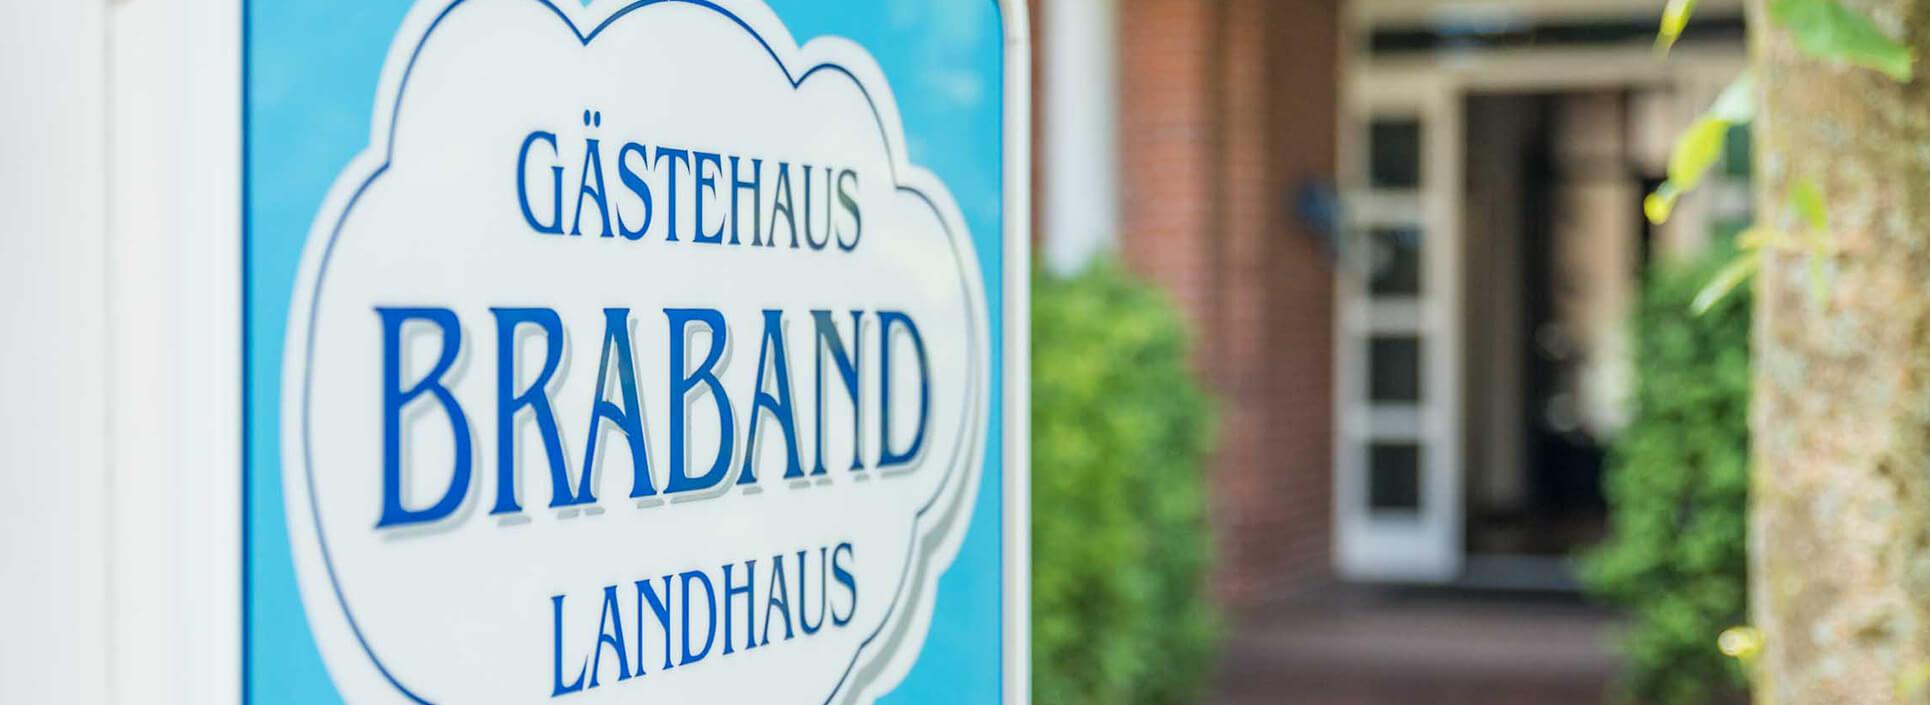 Gästehaus Landhaus Braband